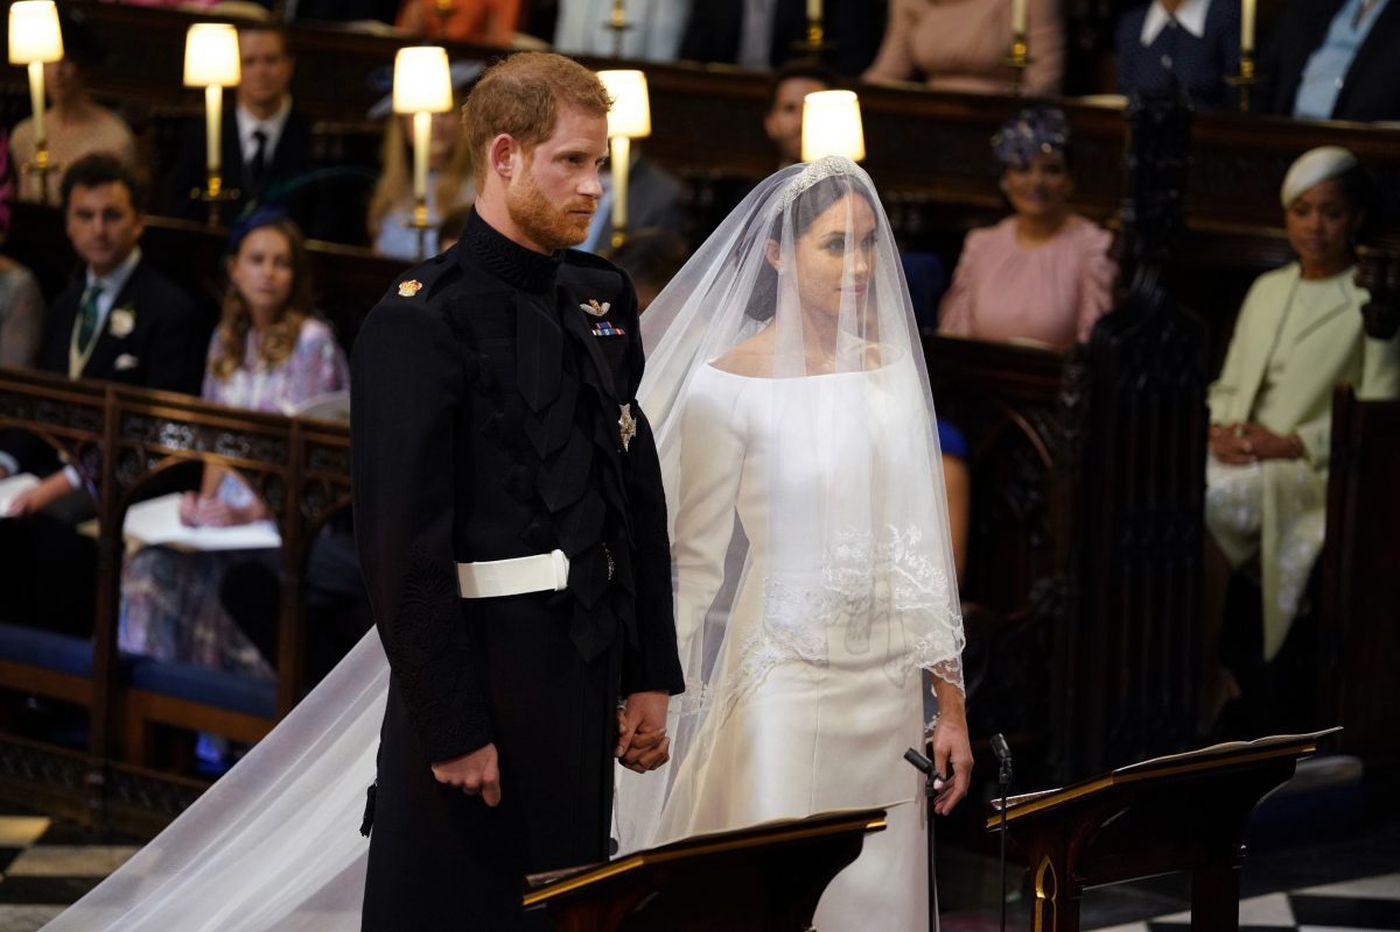 Royal wedding fashion: Meghan Markle sparkles in Clare Waight Keller for Givenchy   Elizabeth Wellington